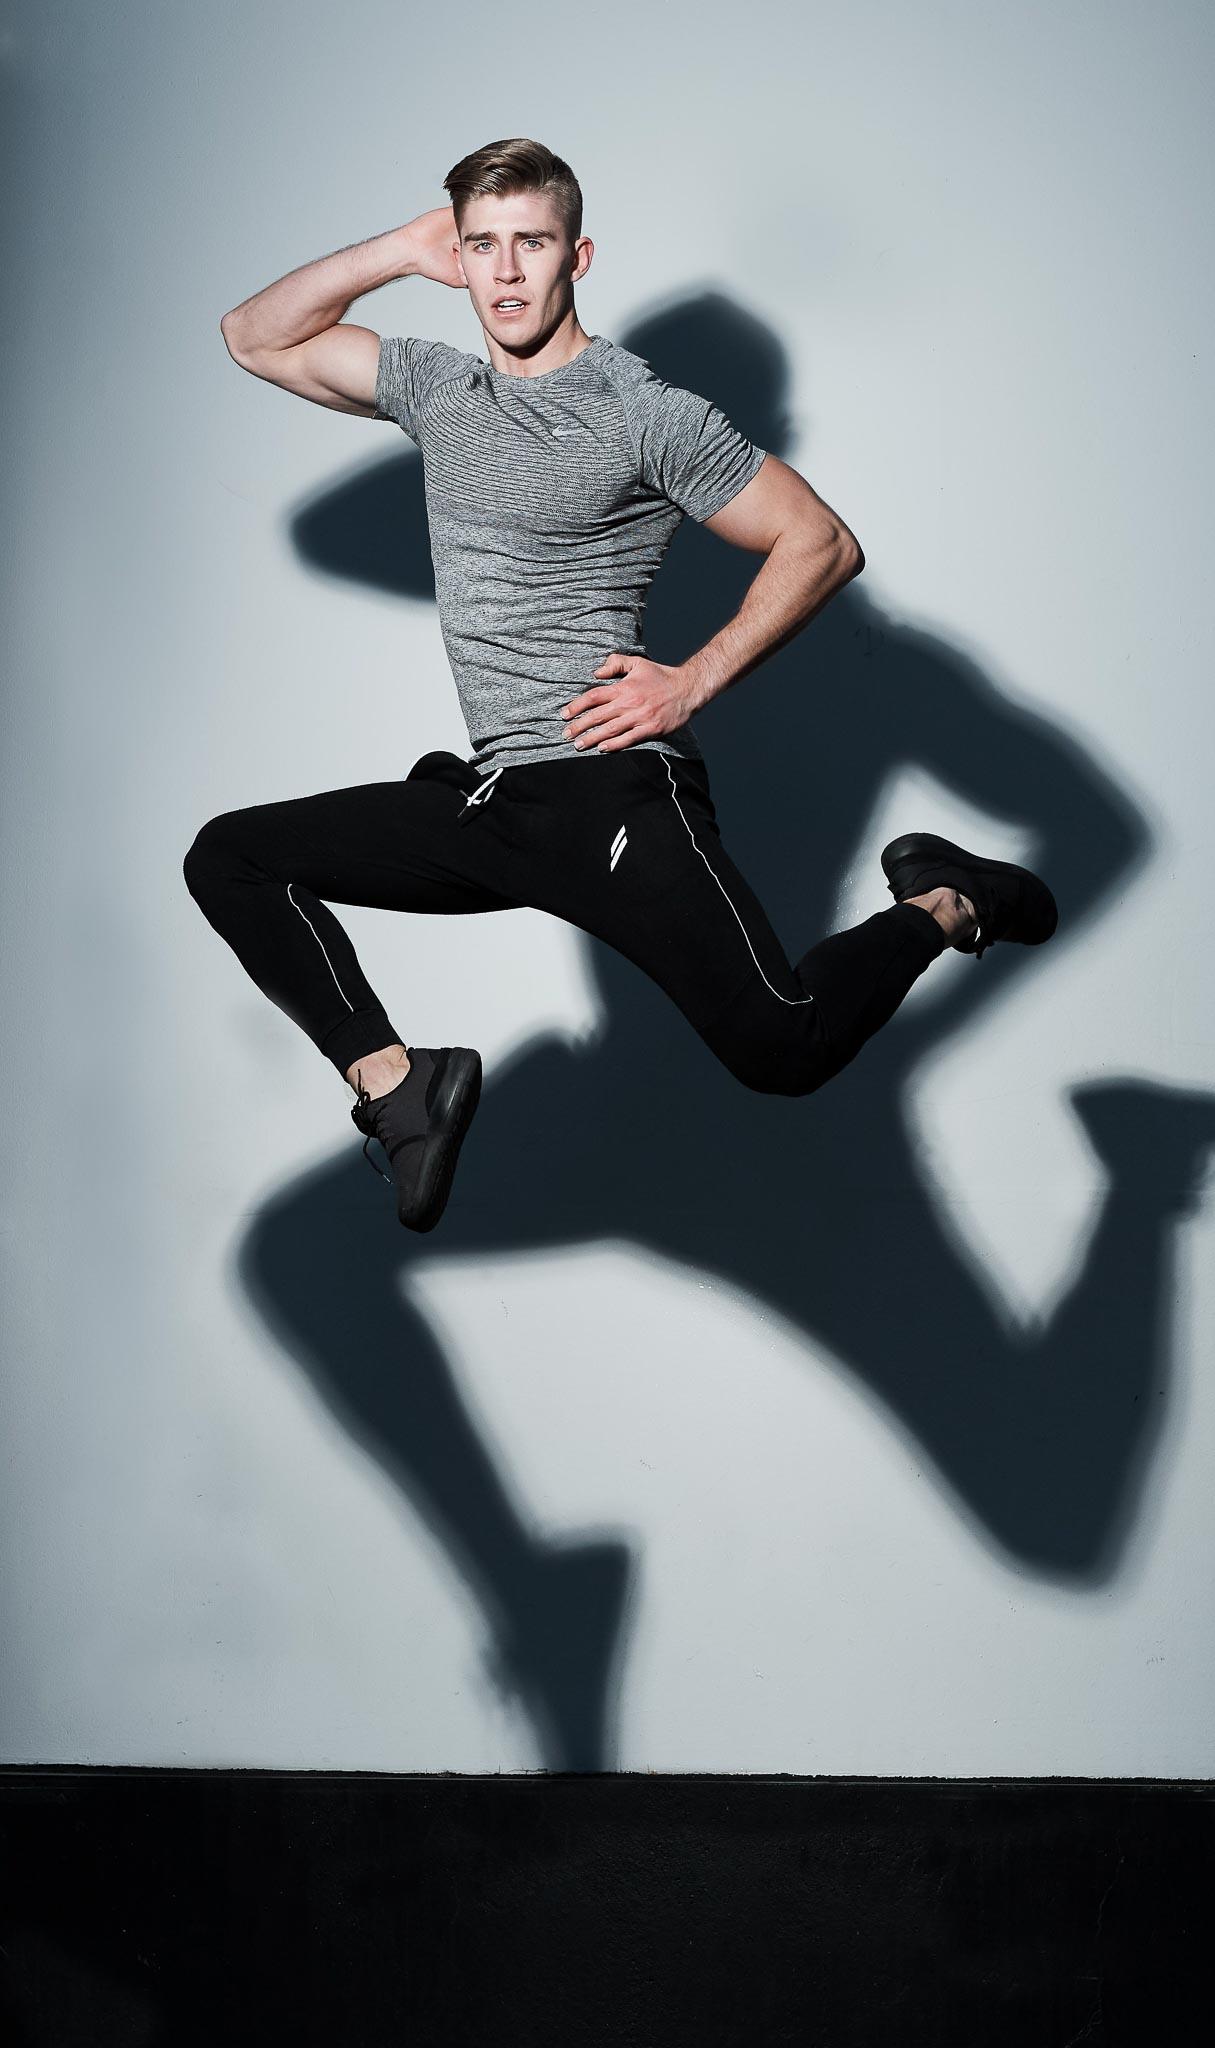 Callum jumping